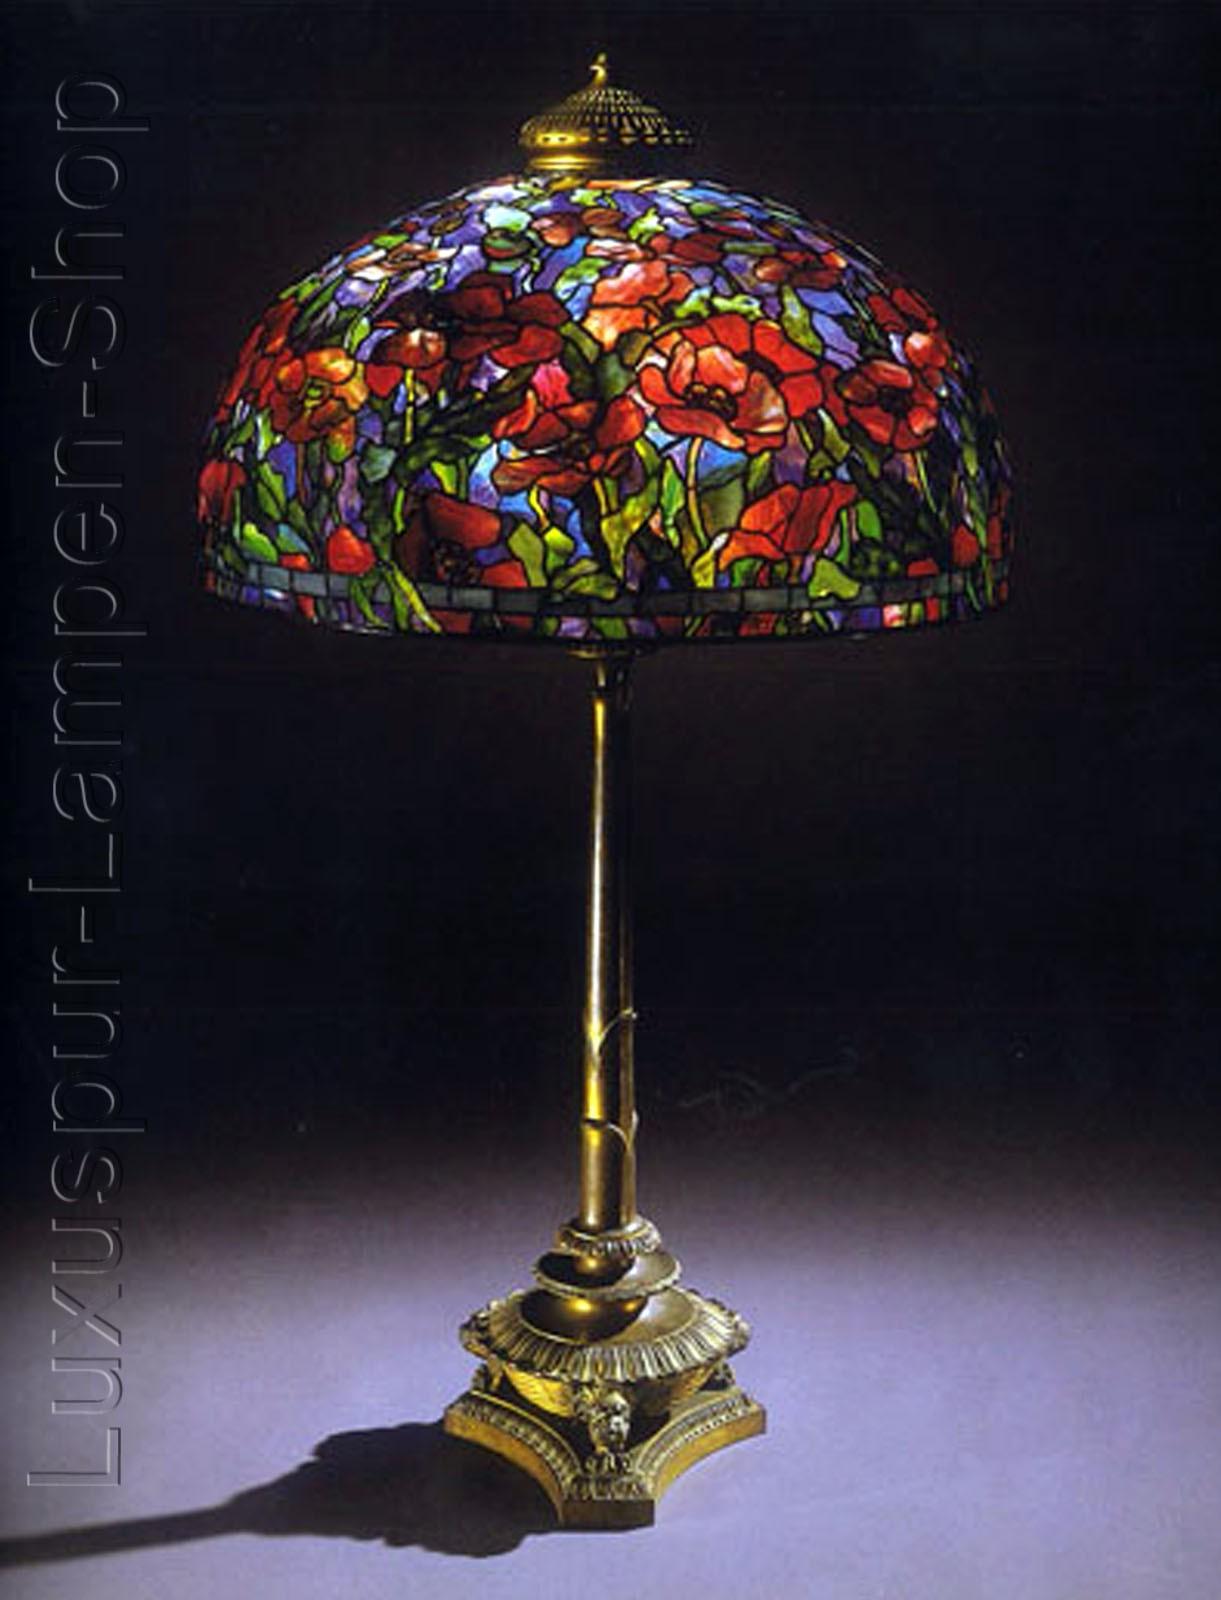 tischlampe replikat einer tiffany lampe im design comaret mit antikem lampenfu aus bronze. Black Bedroom Furniture Sets. Home Design Ideas